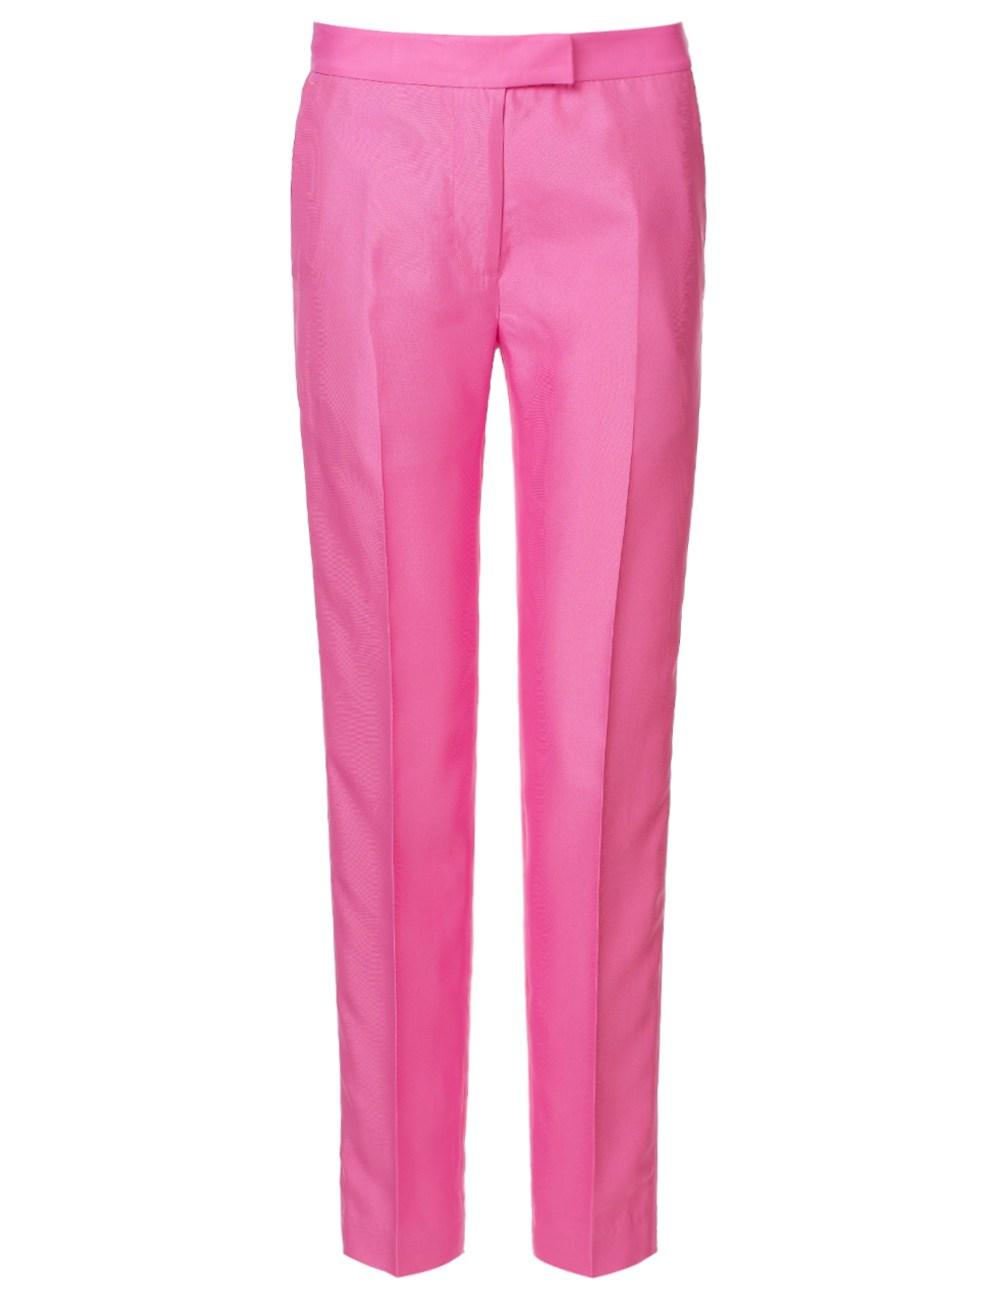 Peony Stripe Tuxedo Trousers | 3.1 Phillip Lim | Avenue32